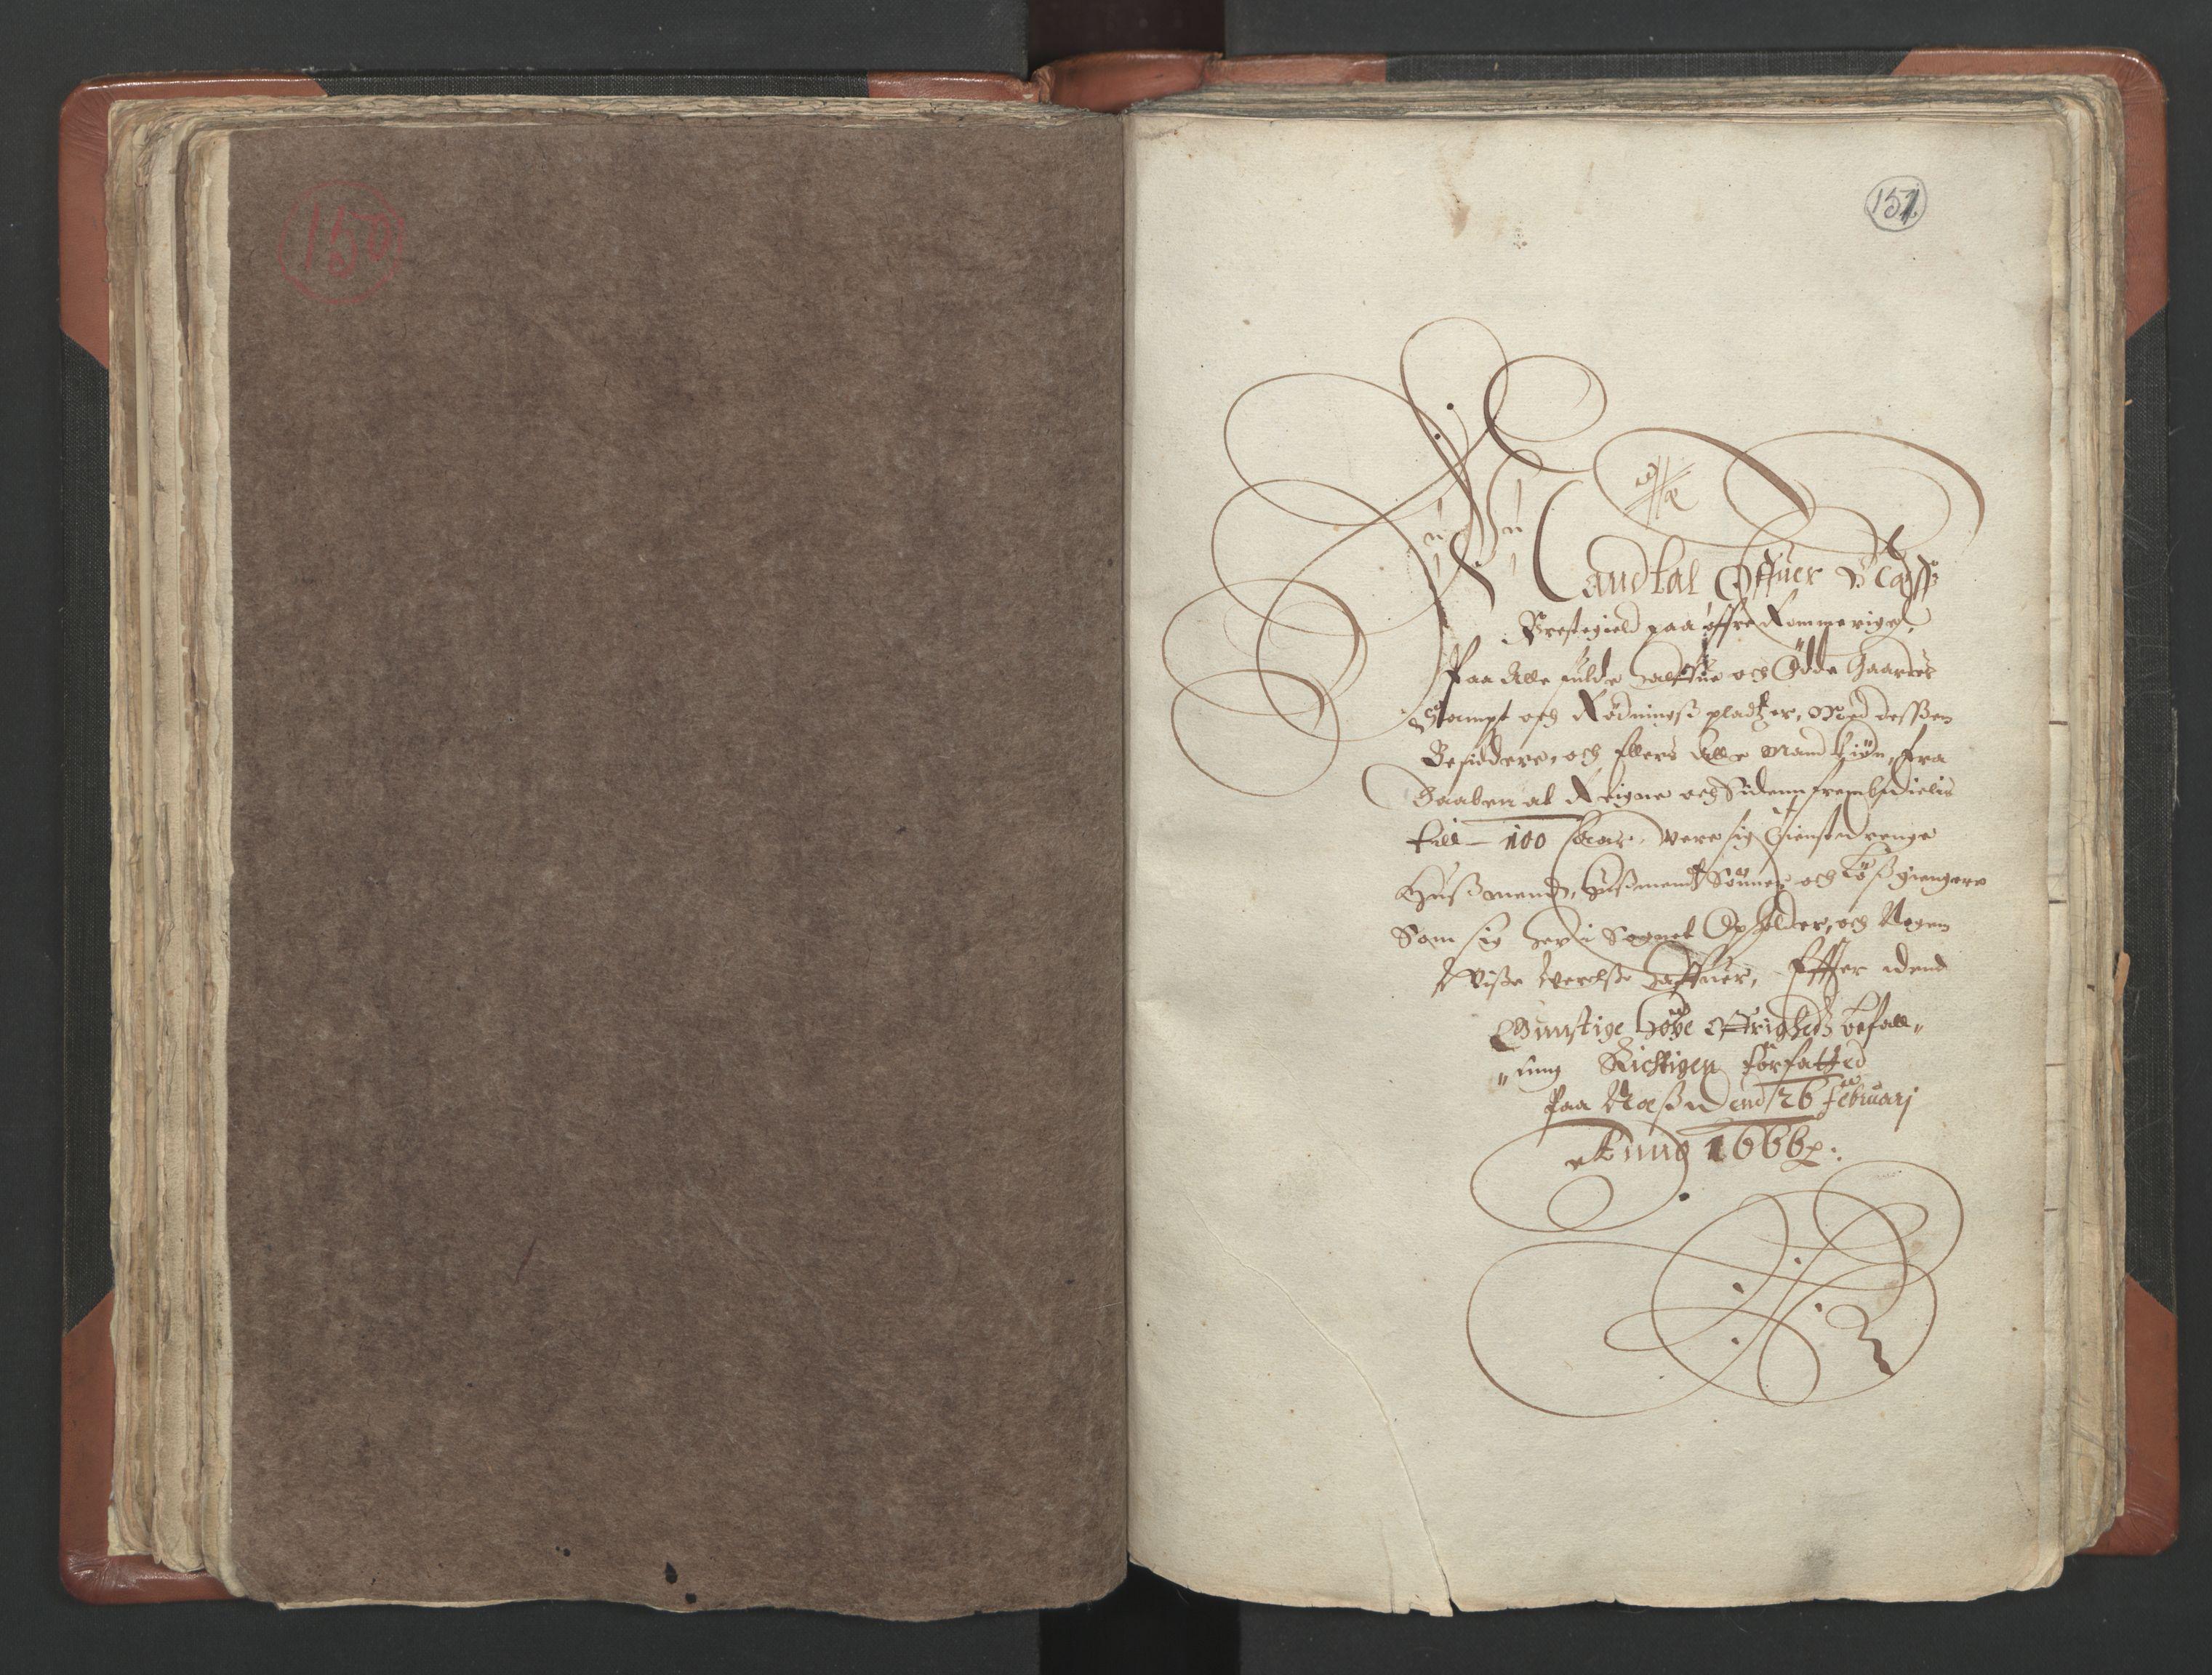 RA, Vicar's Census 1664-1666, no. 4: Øvre Romerike deanery, 1664-1666, p. 150-151